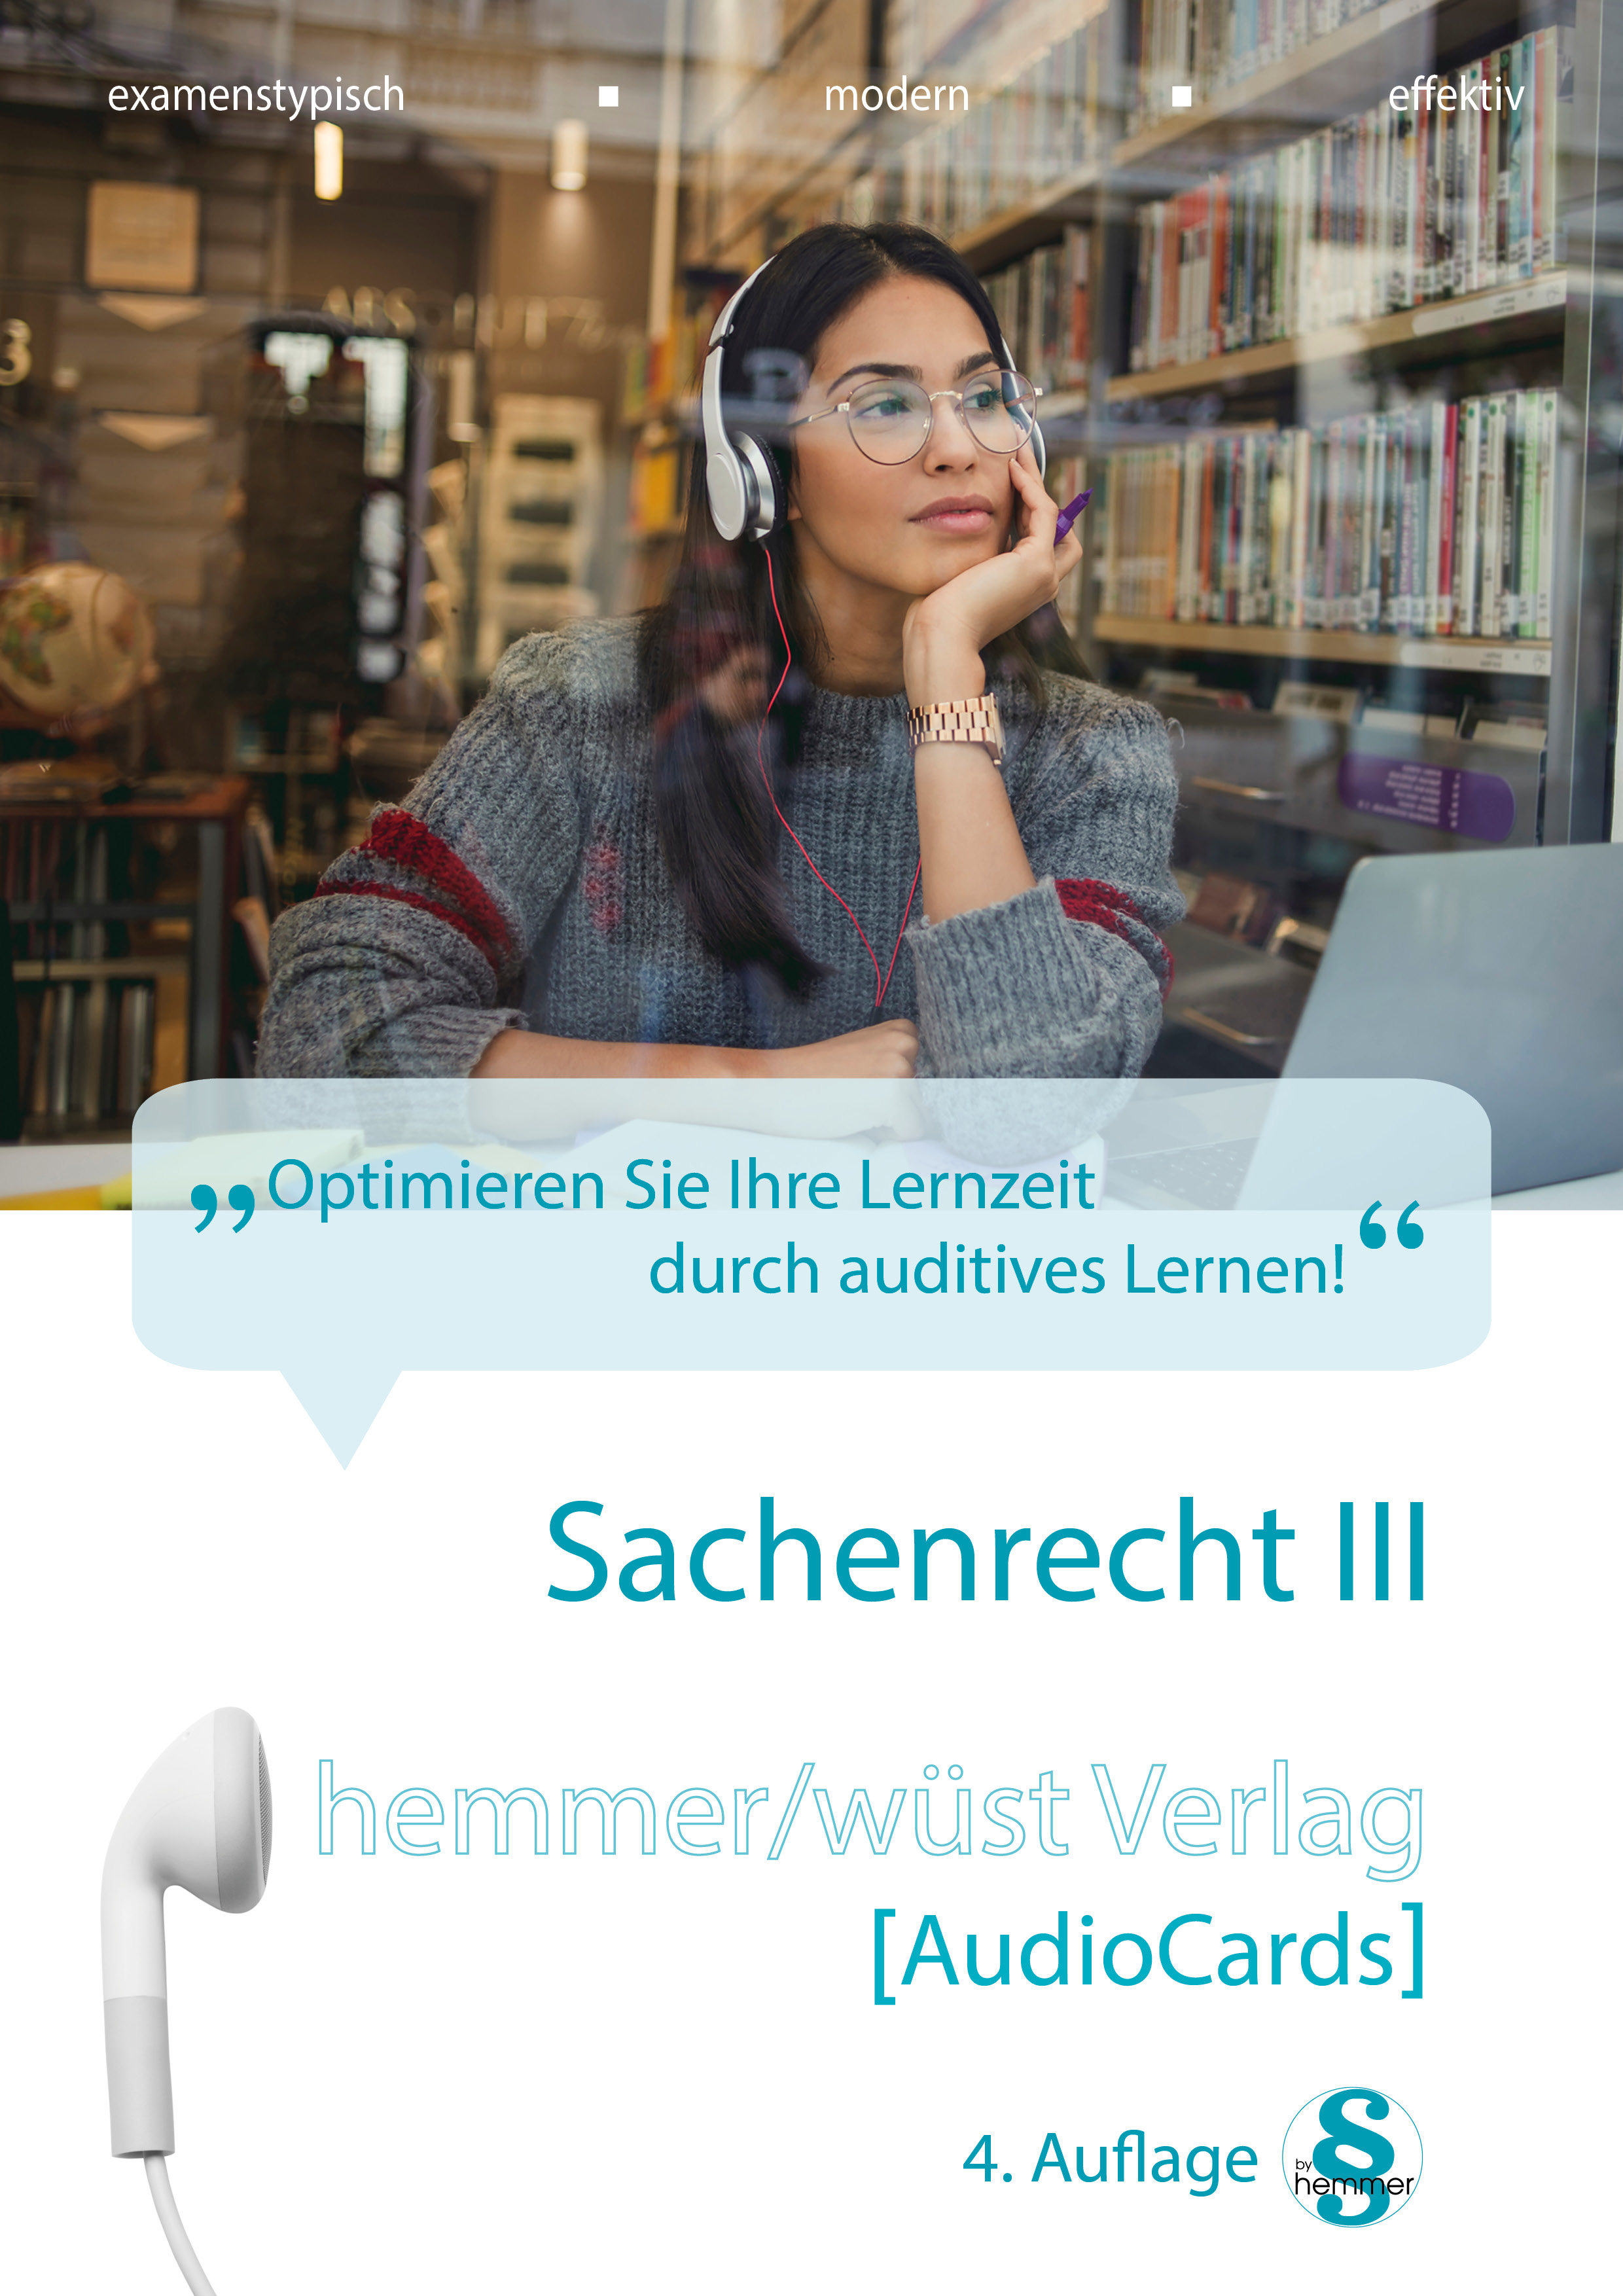 Audiocards - Sachenrecht III - Download